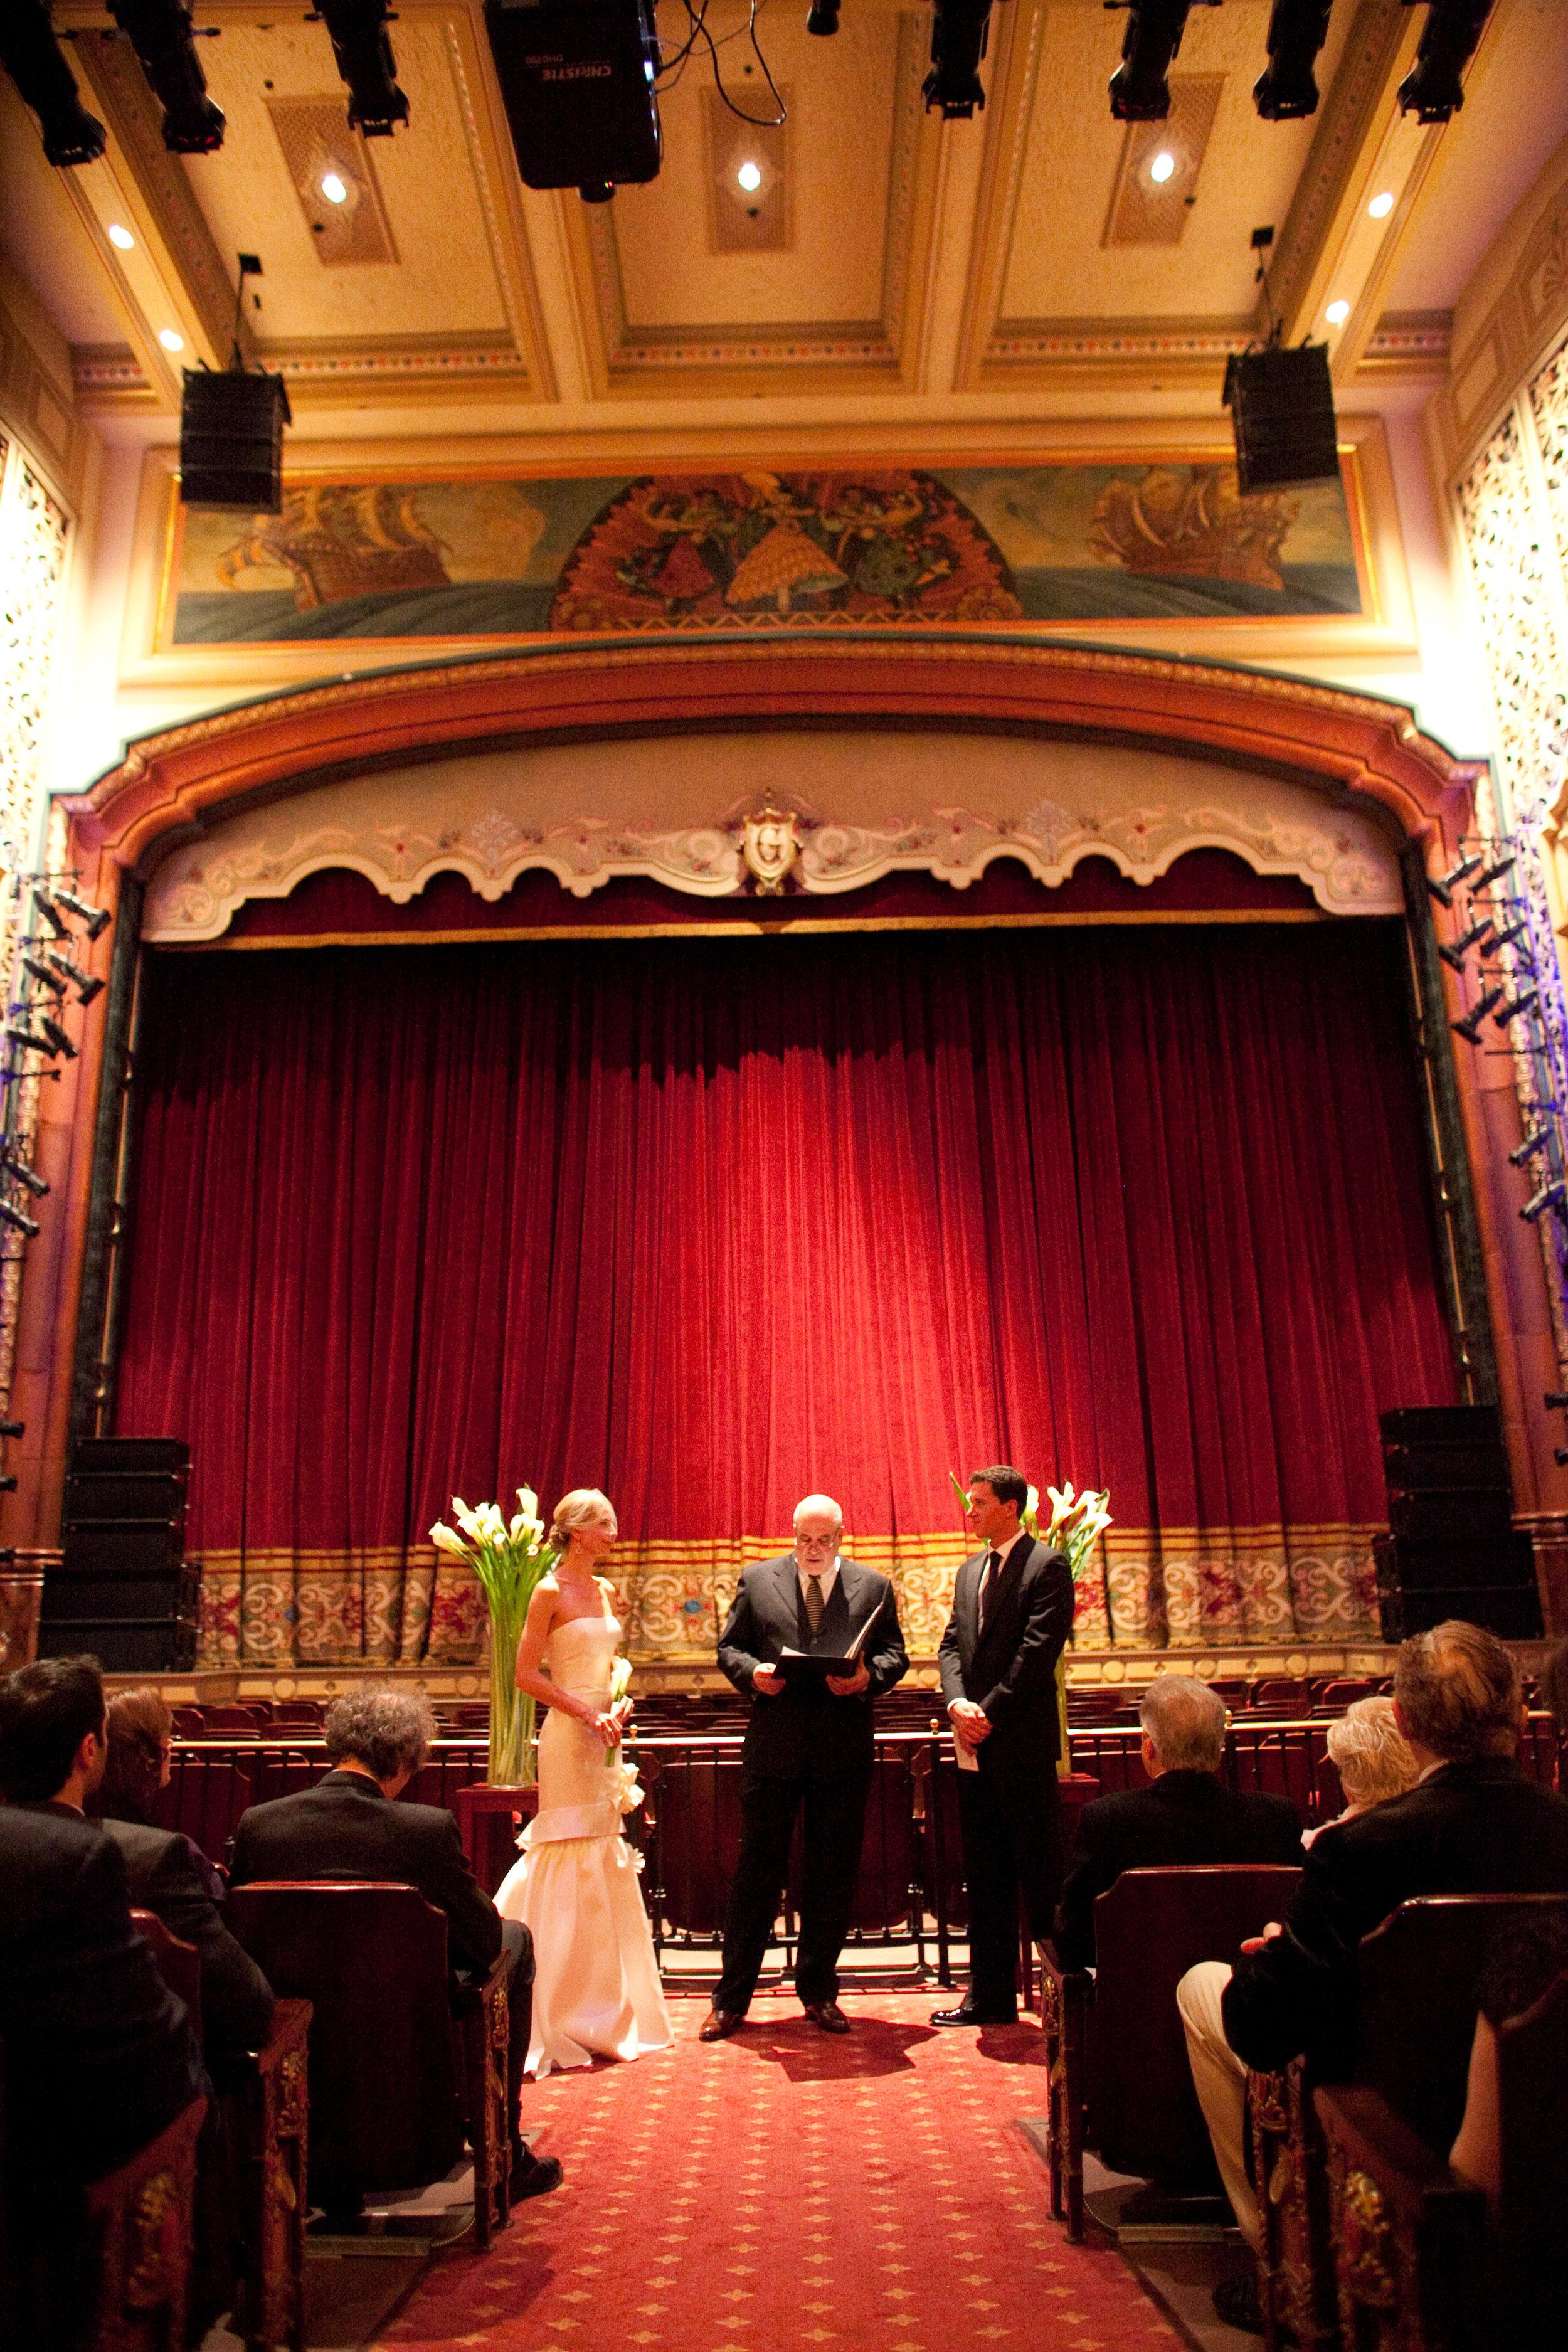 santabarbarawedding.com   The Granada Theatre   Theater Venue   Location Wedding Ceremony